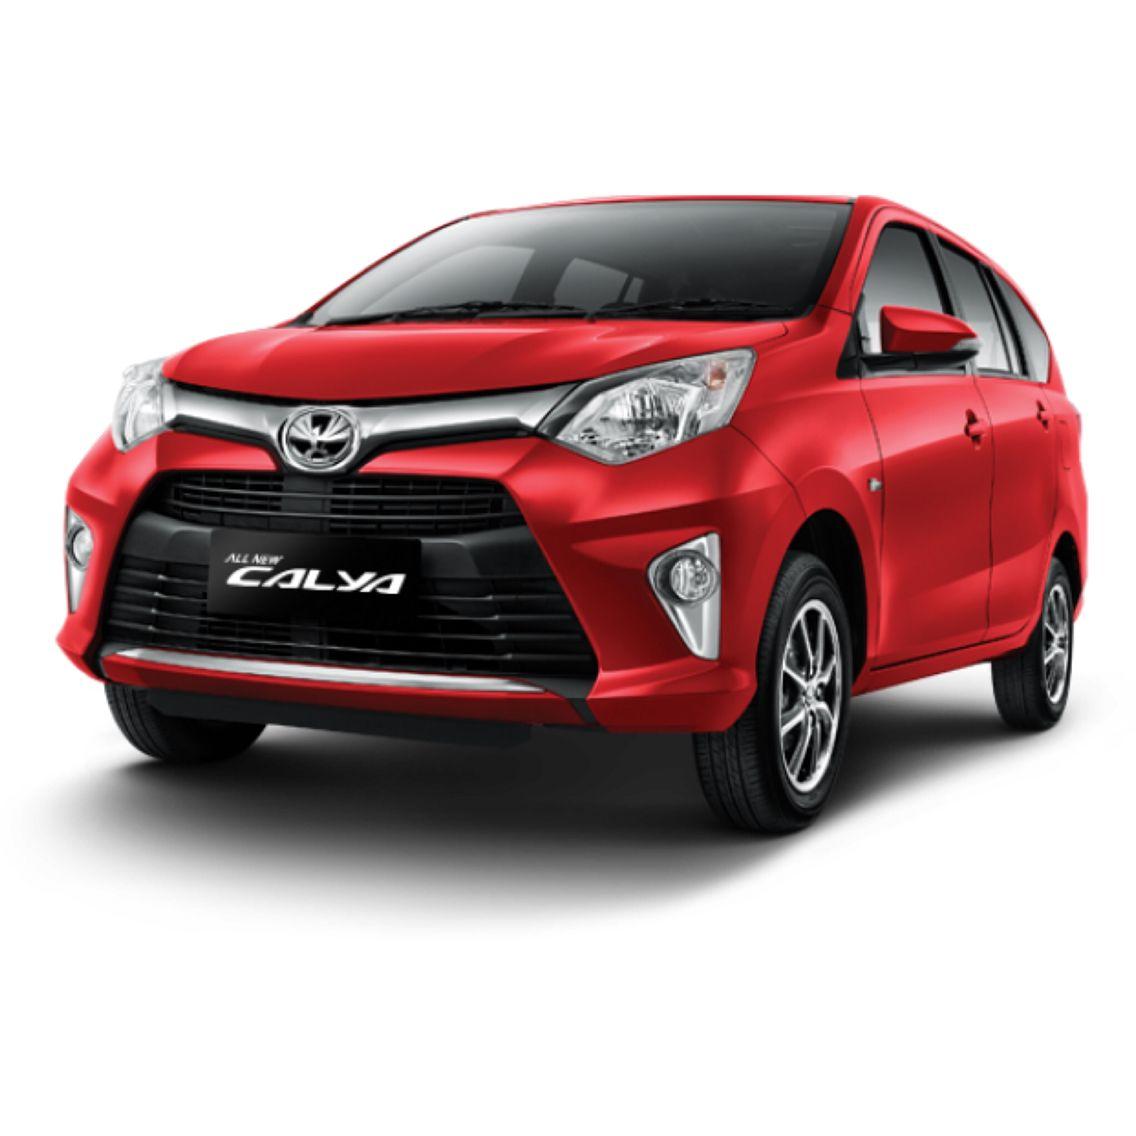 Kelebihan Kekurangan Mobil Toyota Terbaru Perbandingan Harga